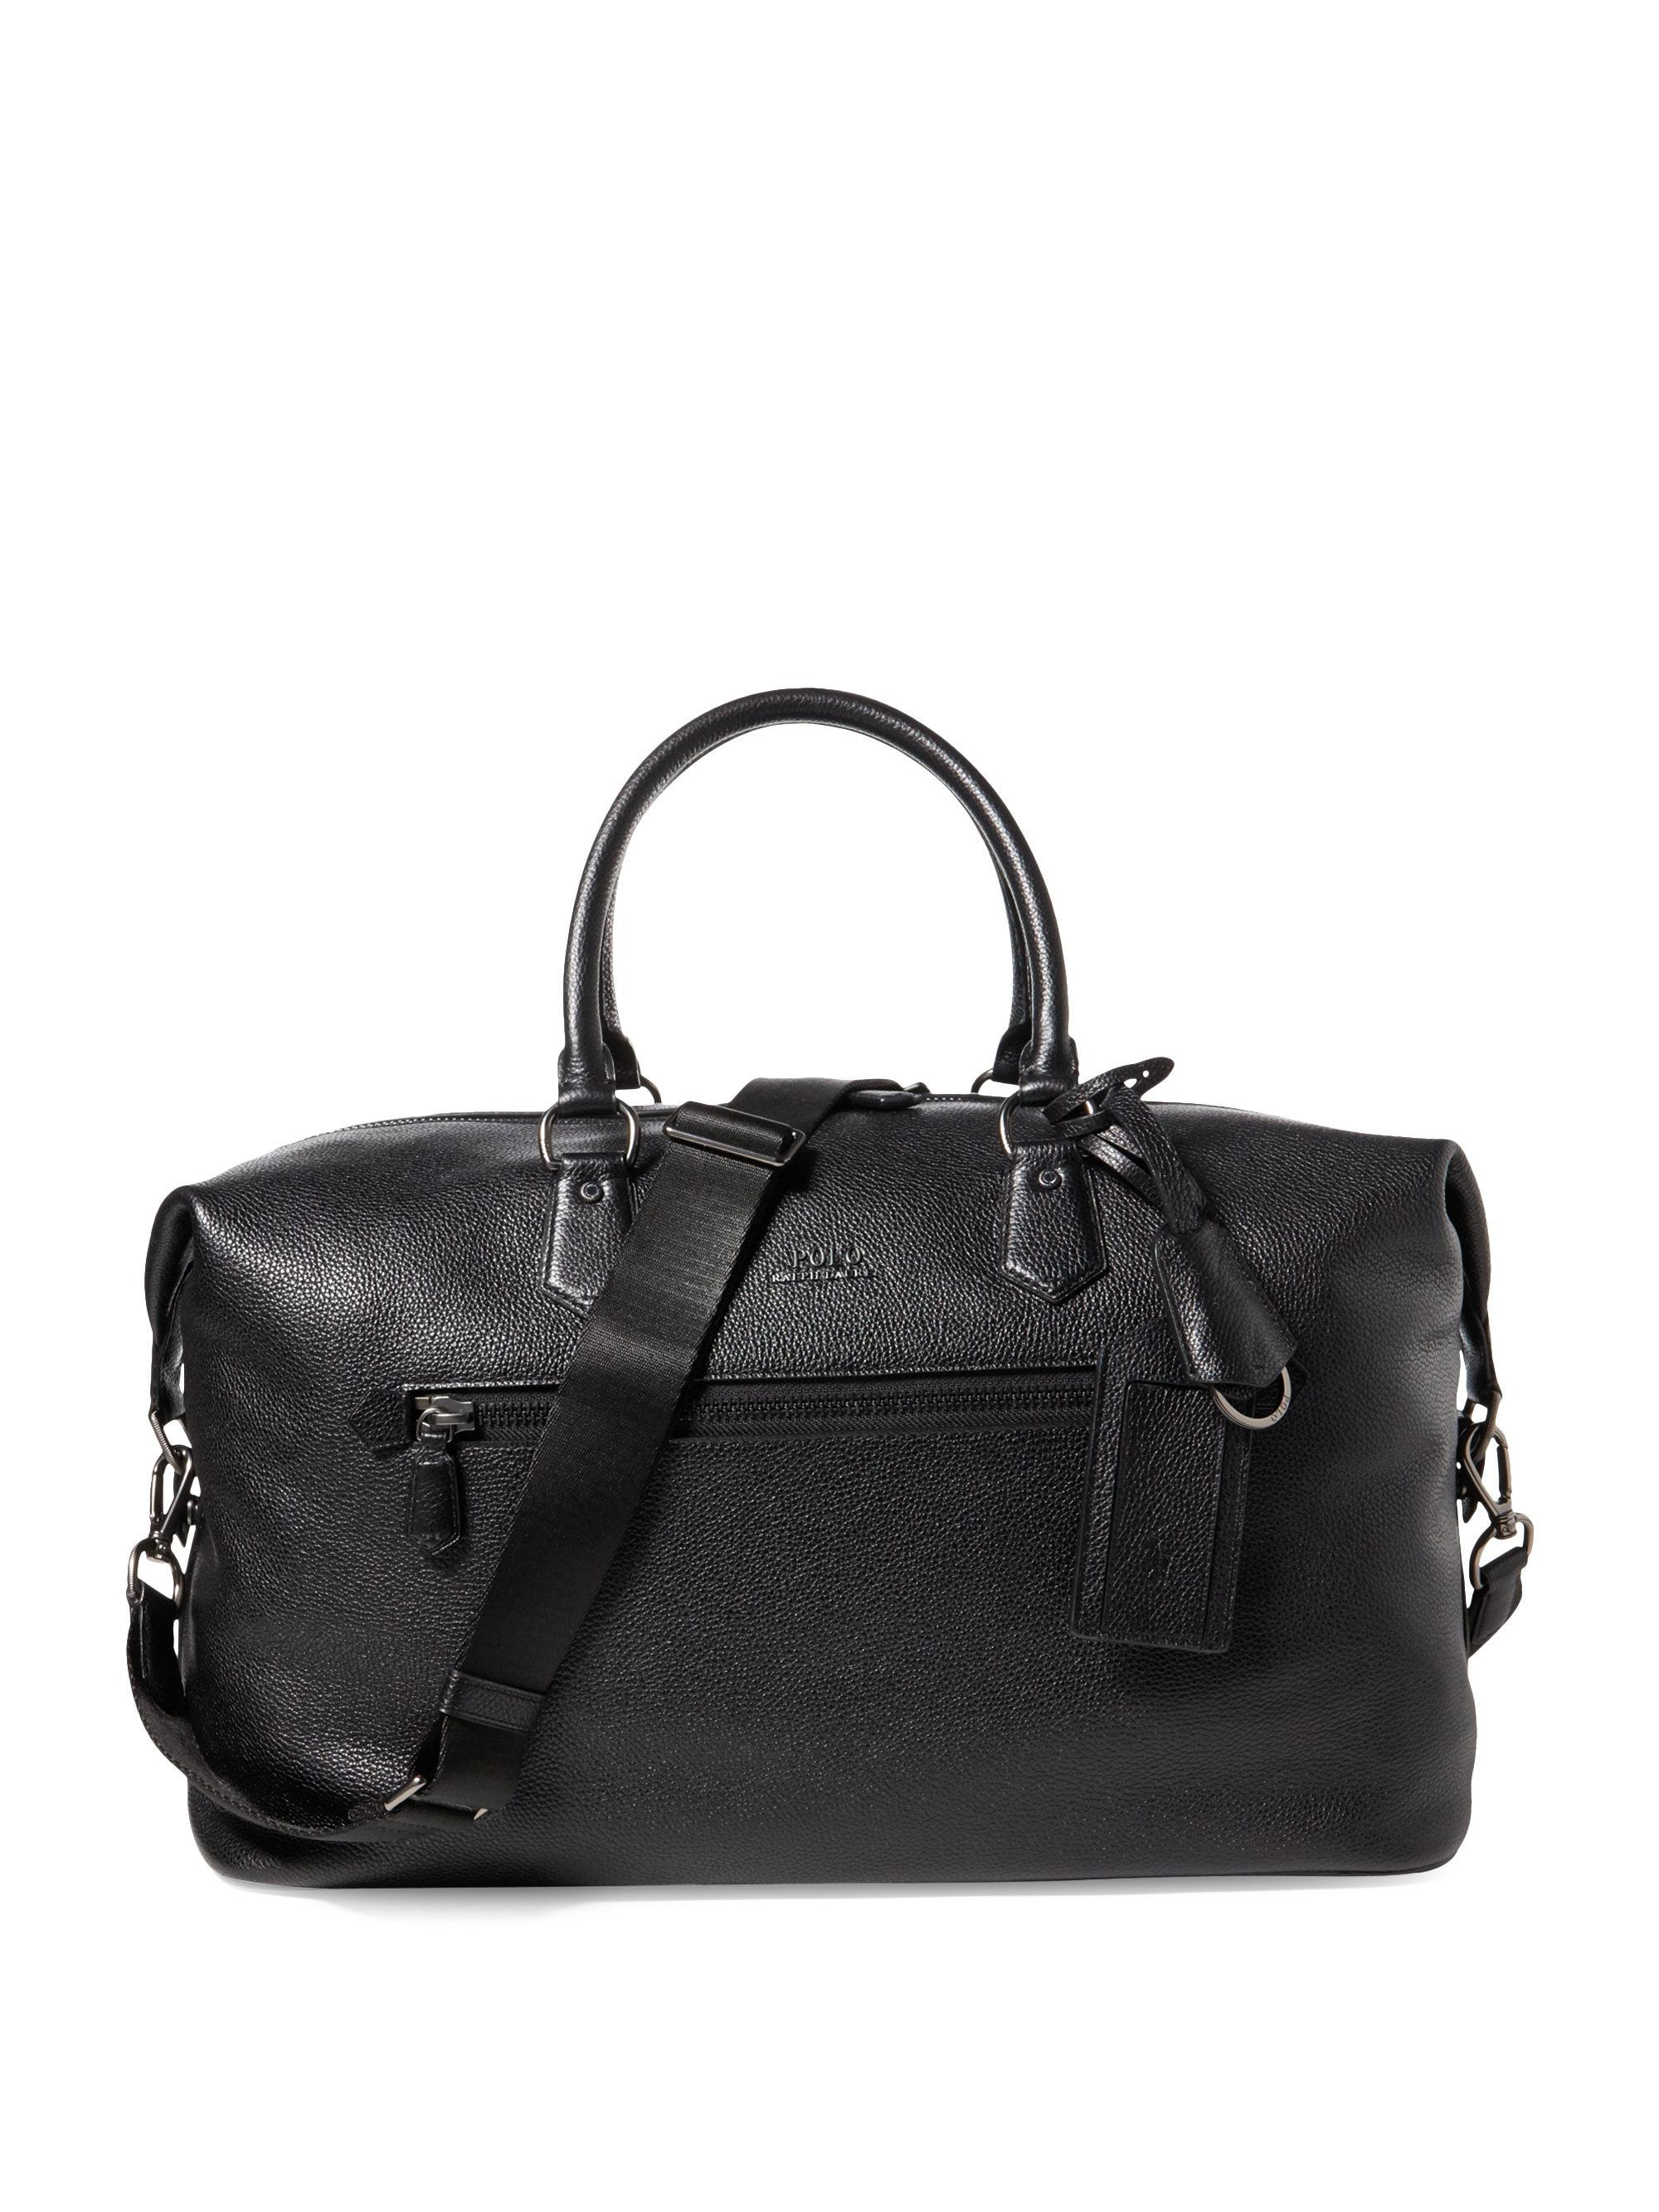 f4bc103997b3 Ralph Lauren Duffle Bag Amazon